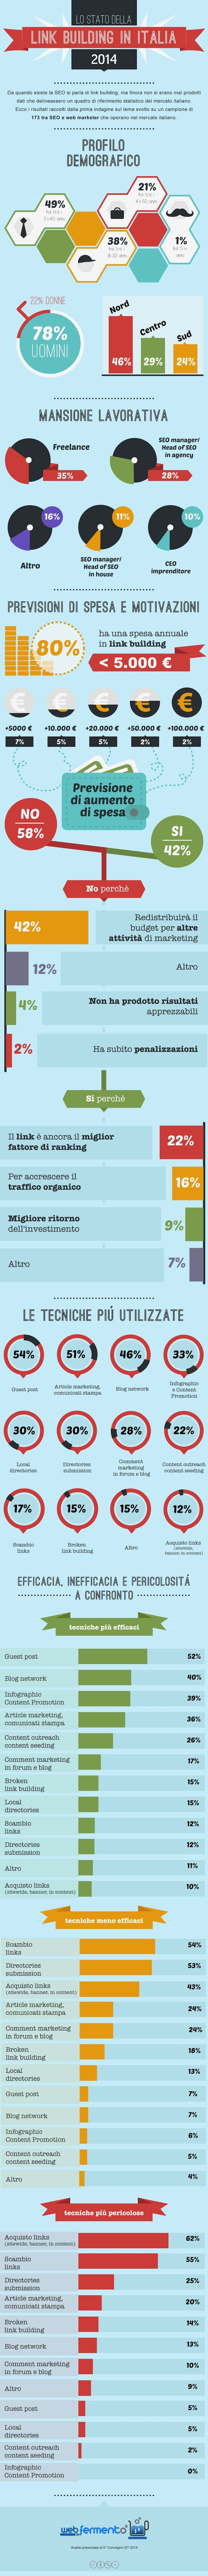 #linkbuilding in Italia 2014